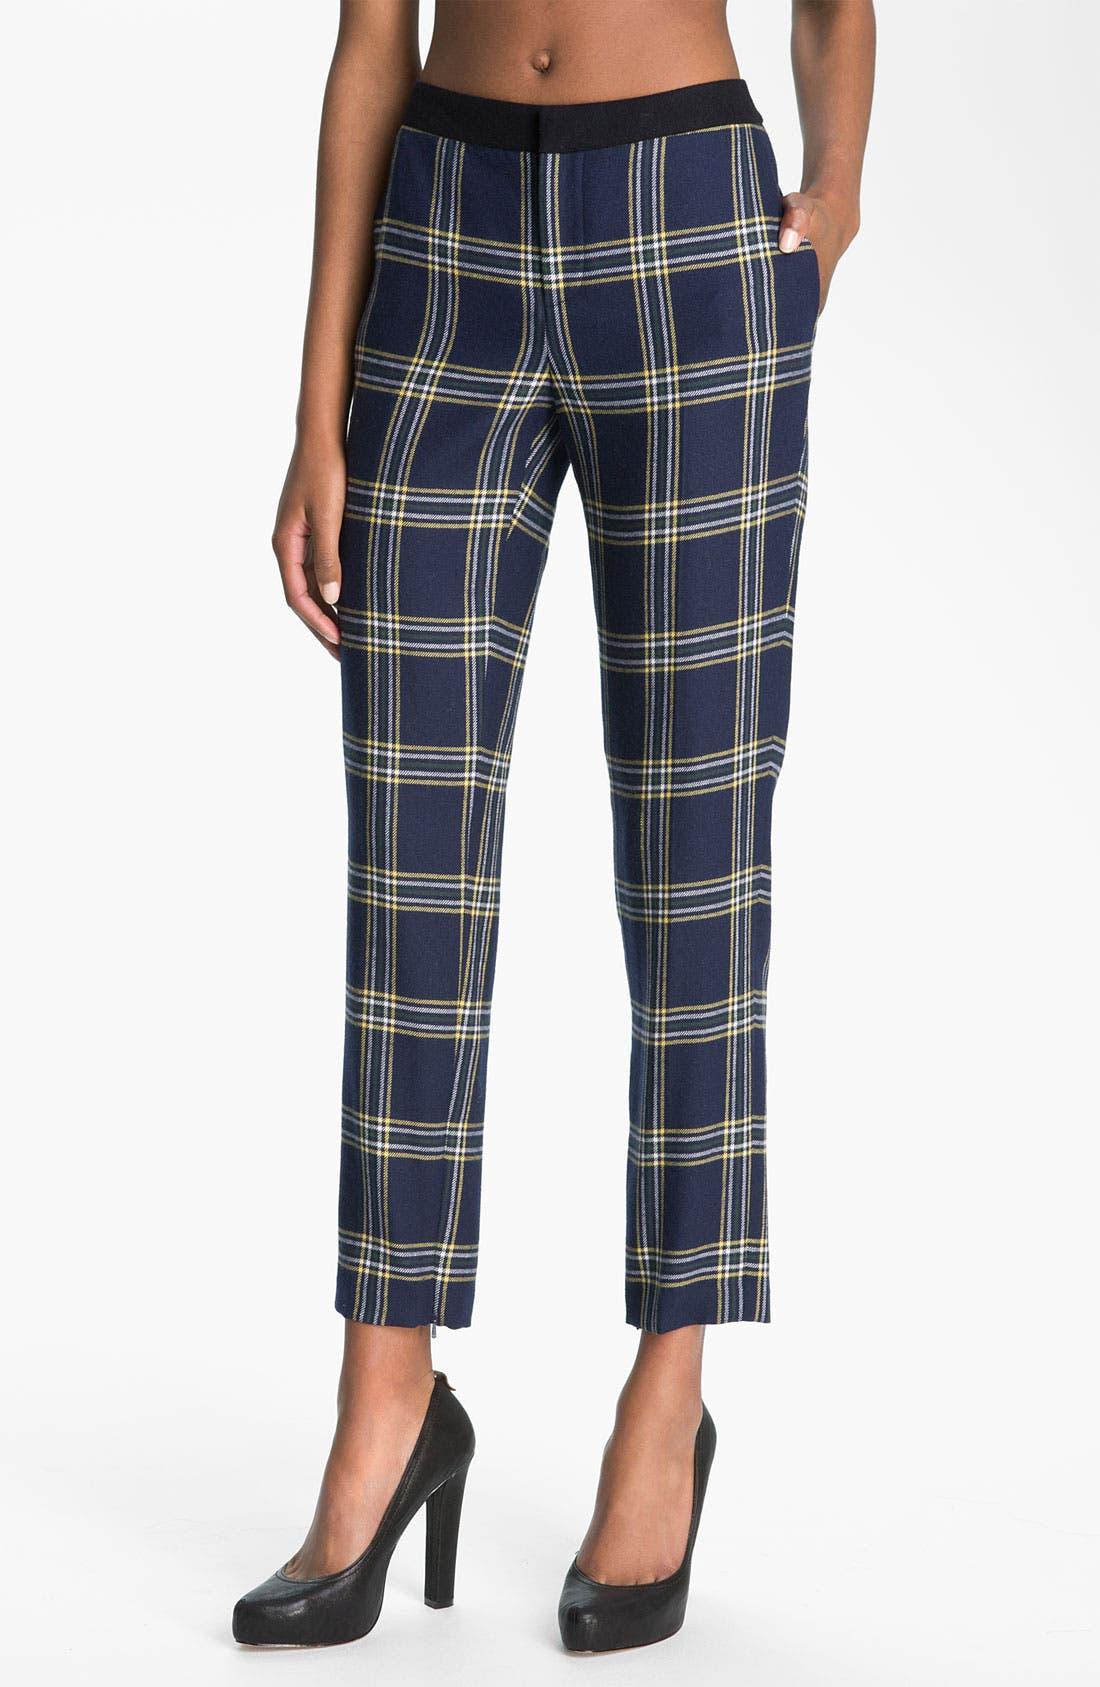 Alternate Image 1 Selected - Juicy Couture 'Eton' Plaid Crop Pants